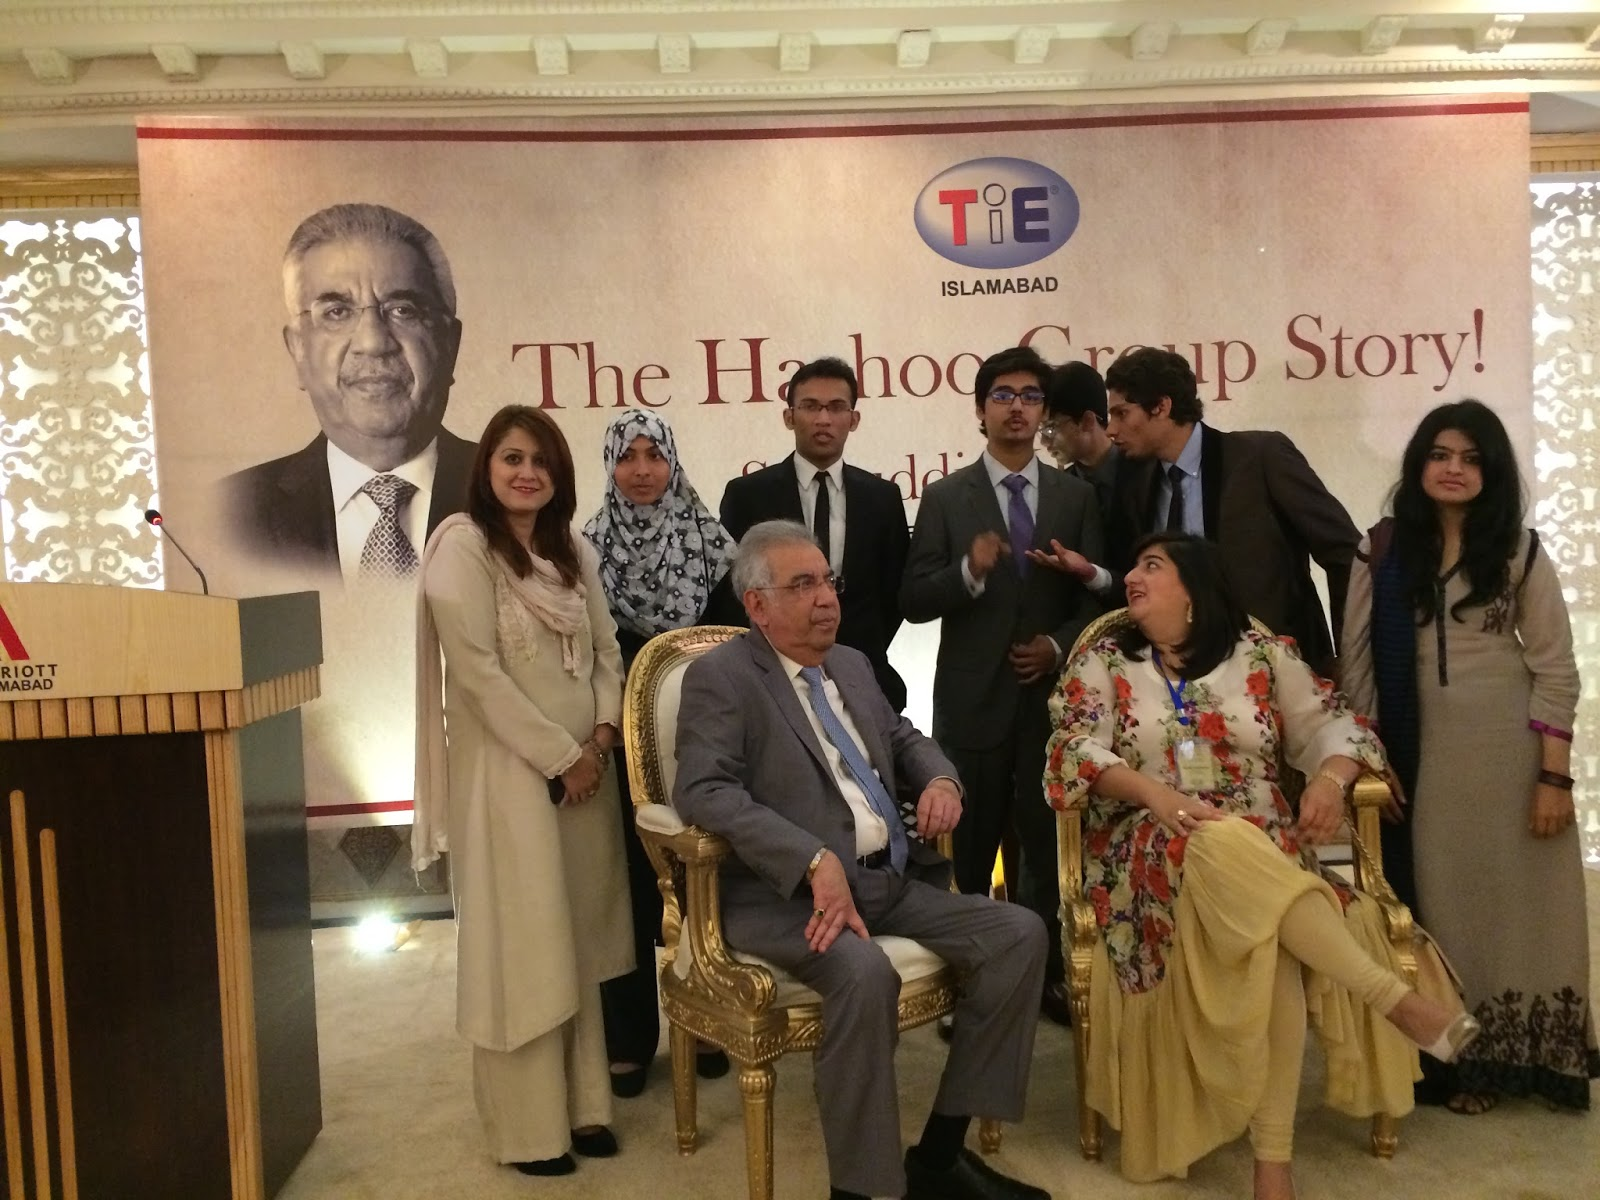 sadrudin-hashwani-sara-hashwani-book-launch